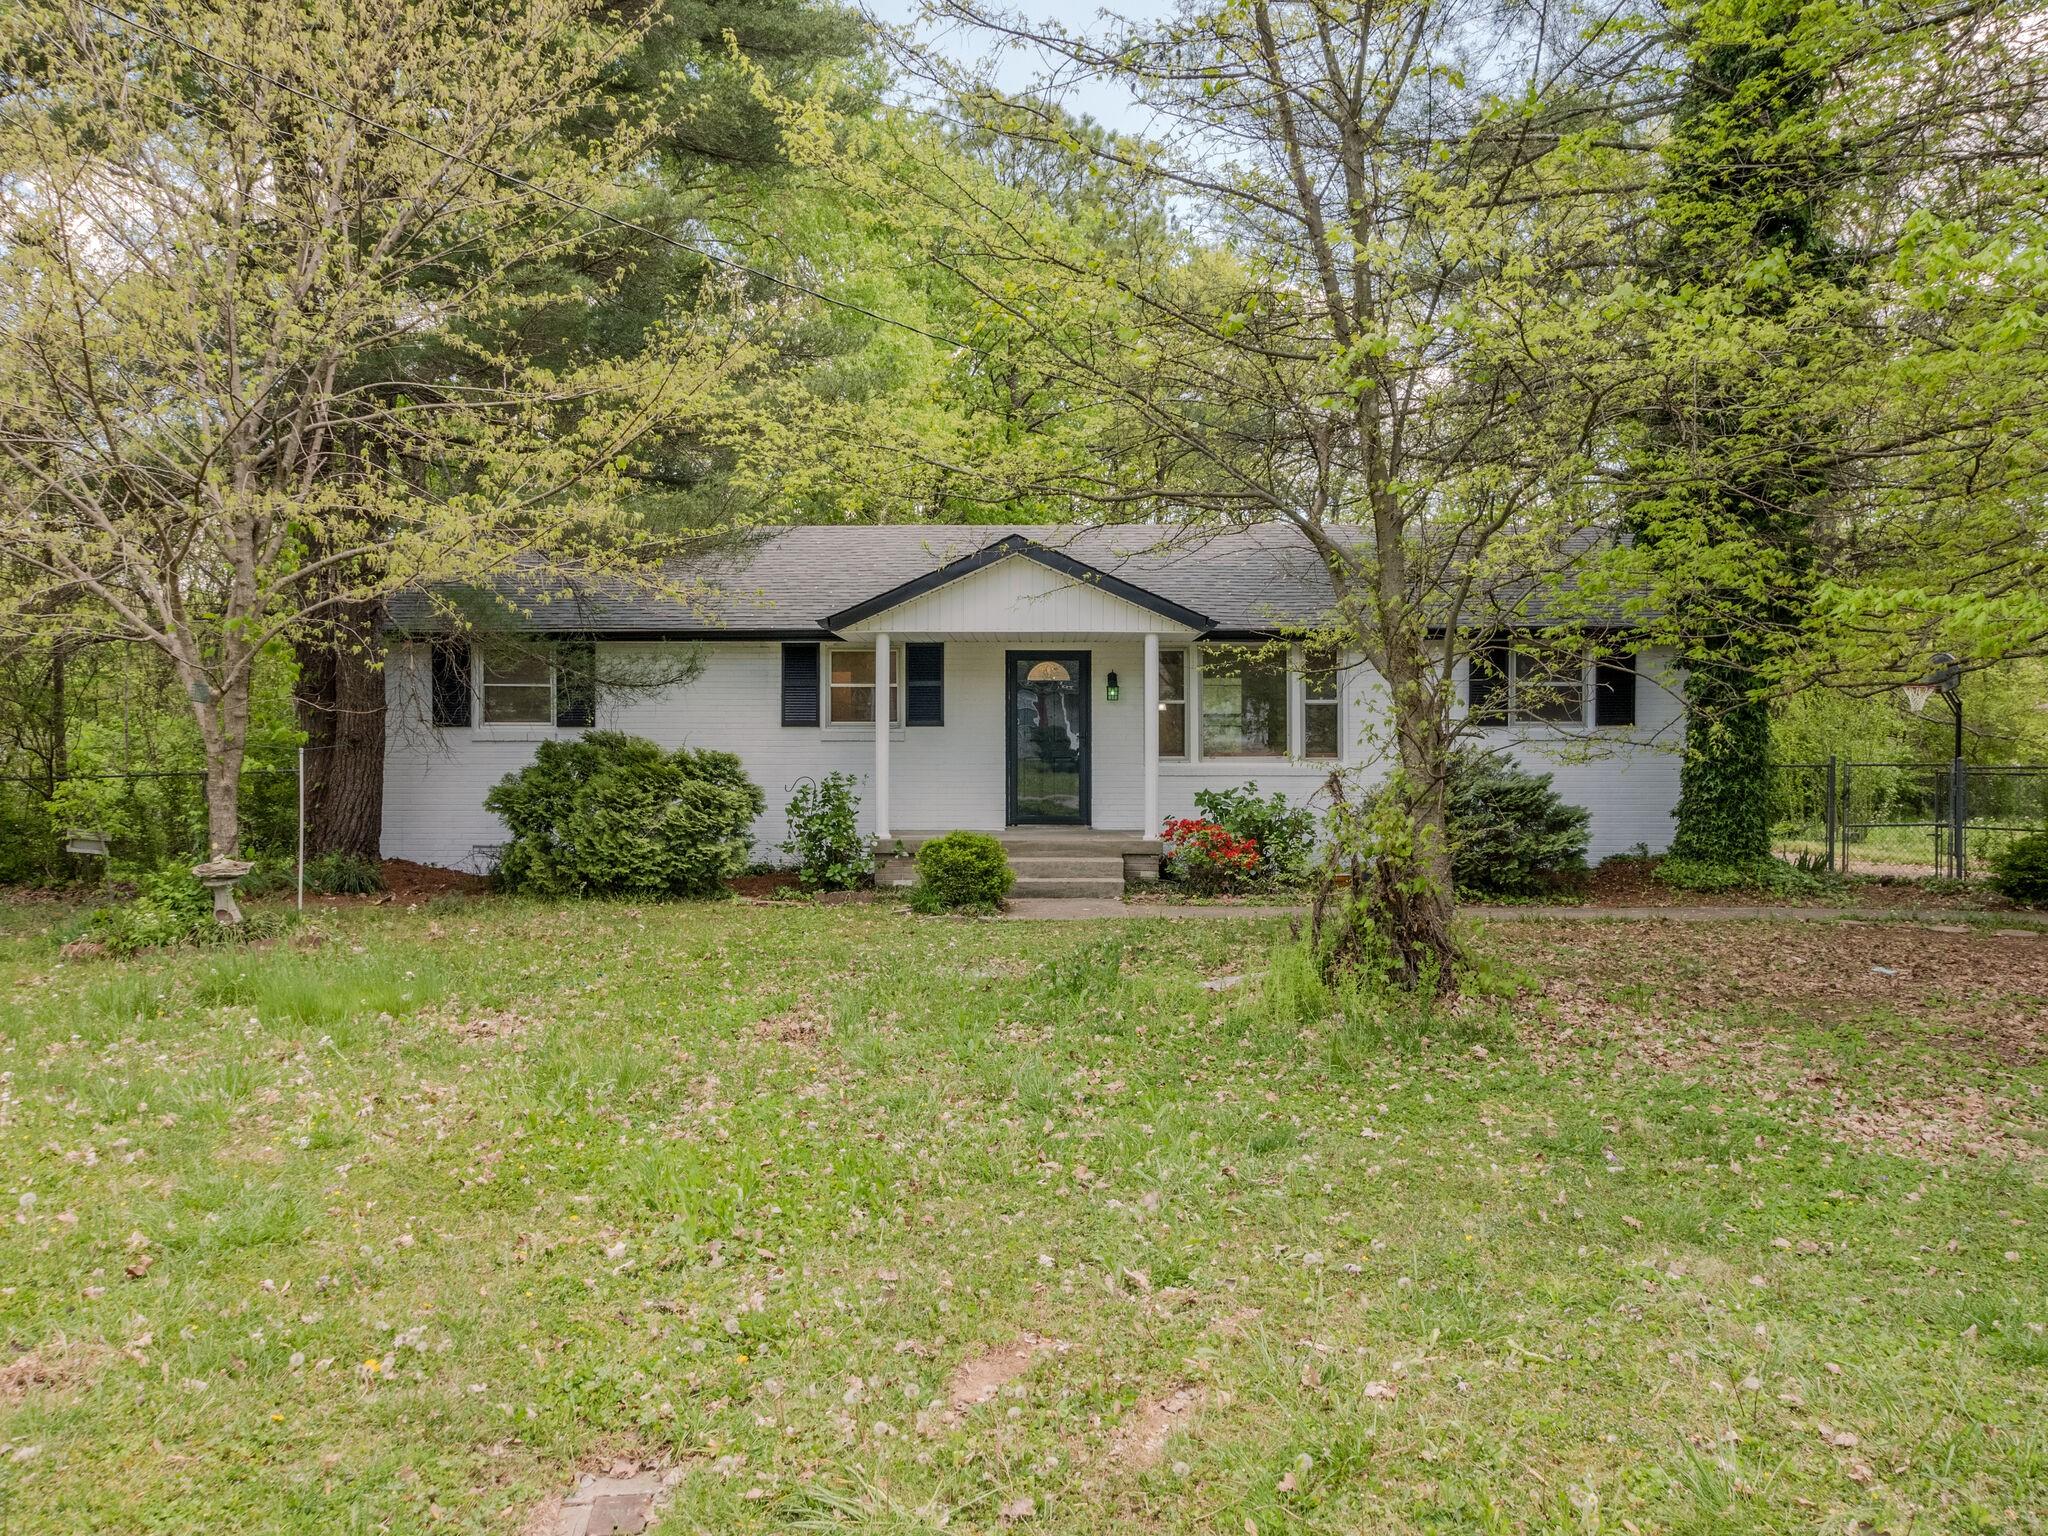 157 Elm St Property Photo - LA VERGNE, TN real estate listing